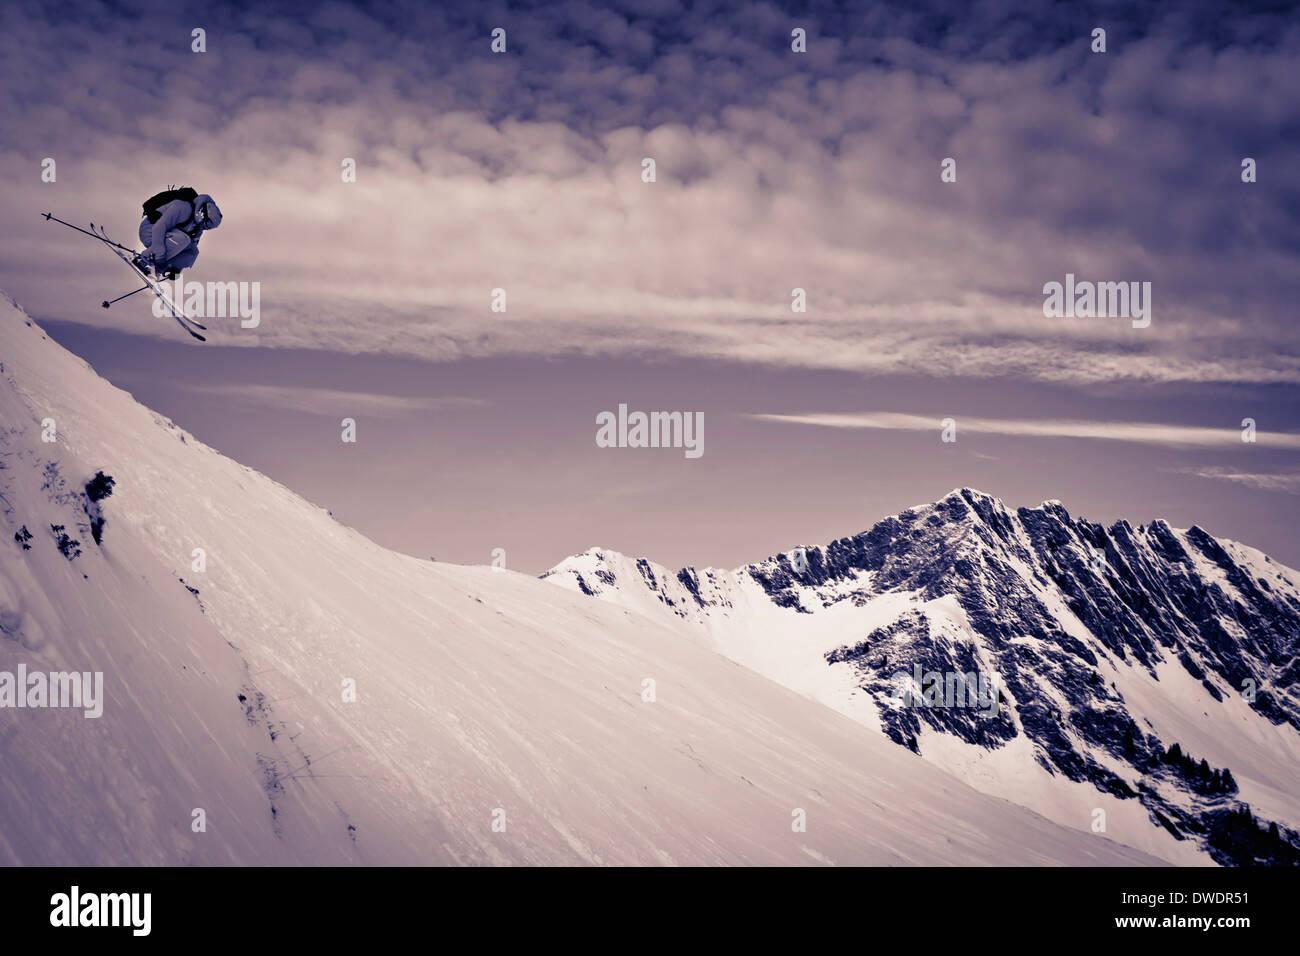 Austria, Tyrol, Kitzbuehel, Man off-piste skiing - Stock Image